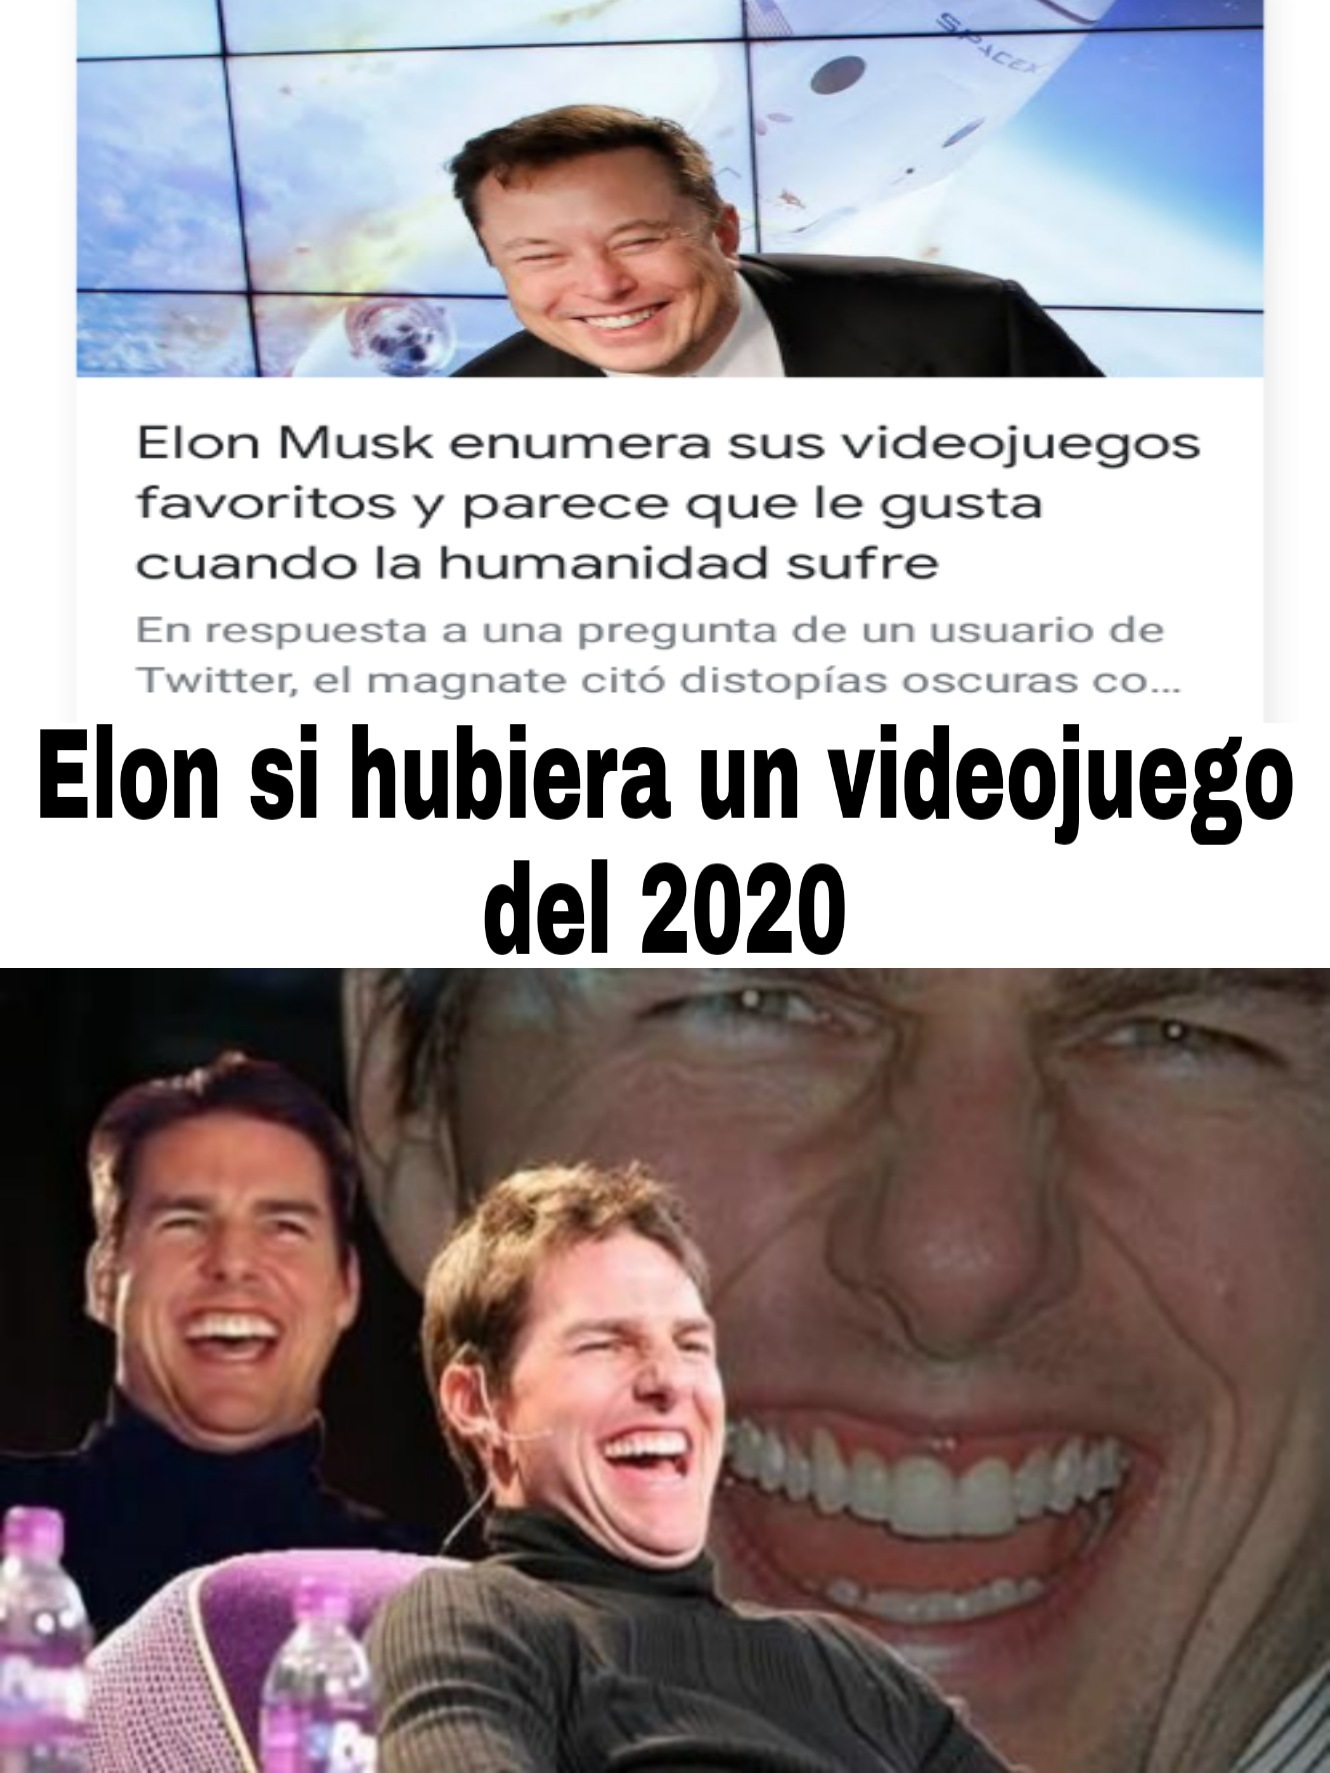 O half life, o BioShock - meme